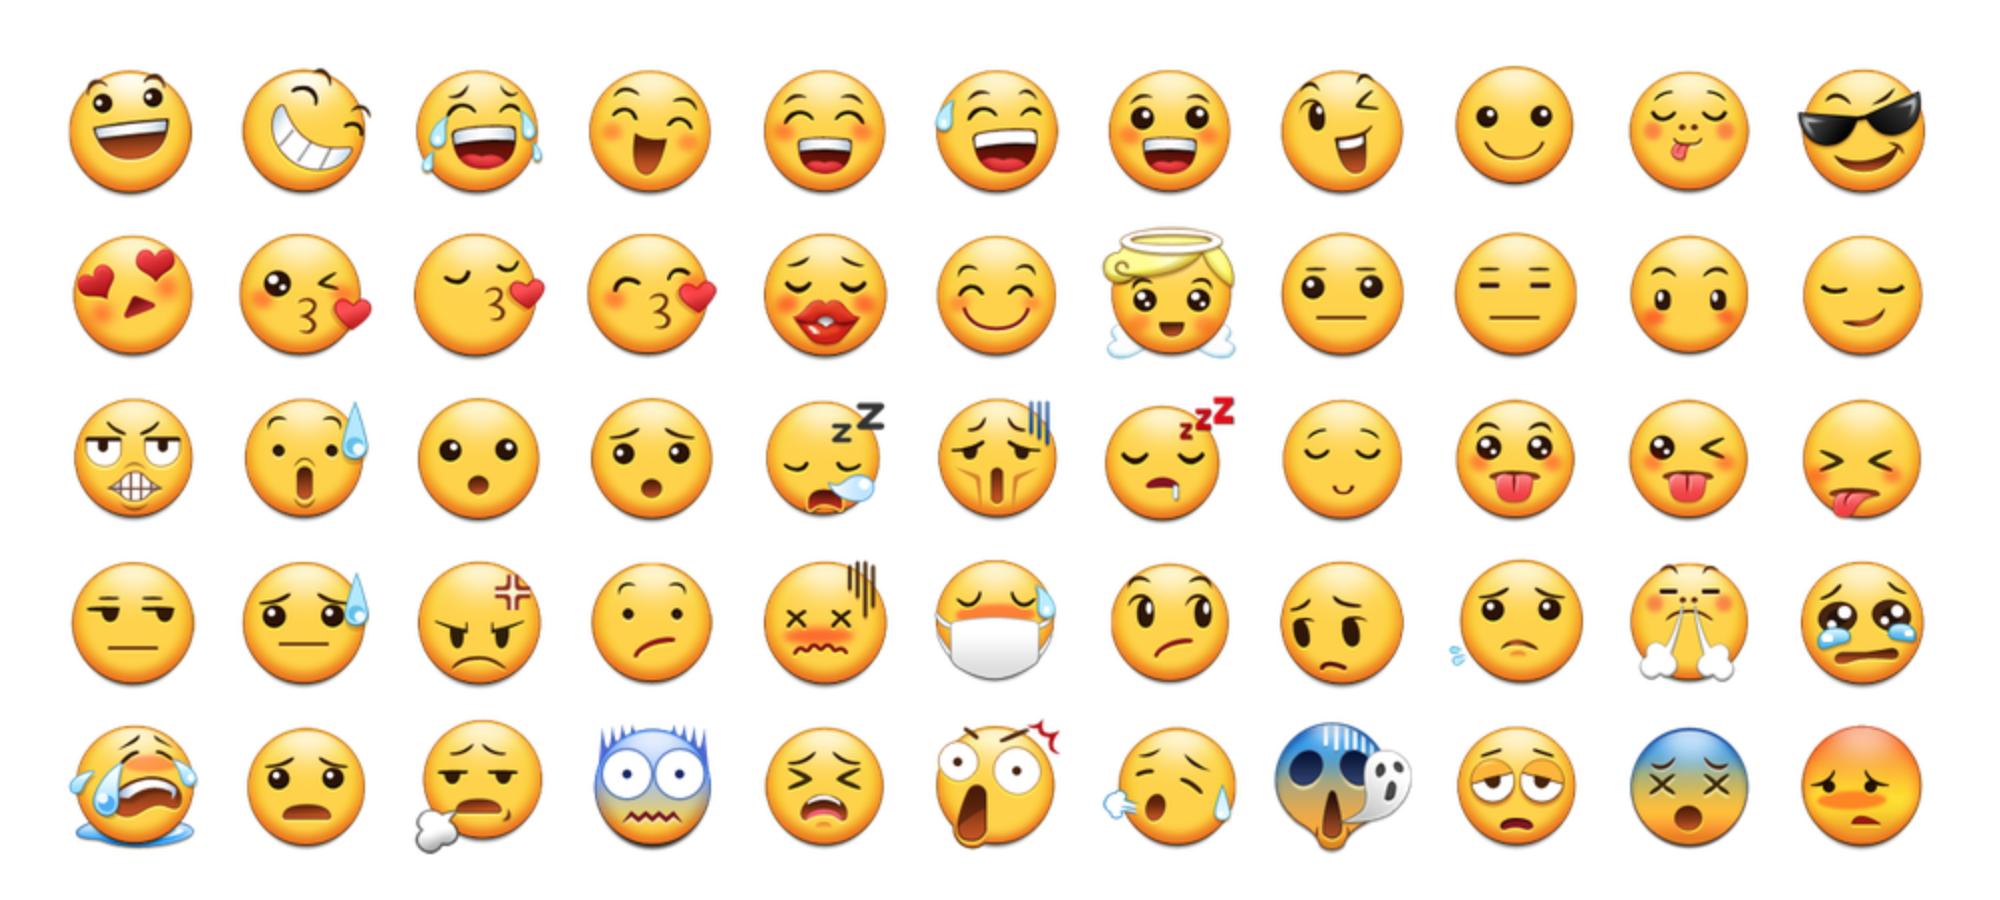 New To Emojipedia Samsung Facebook Emoji One Emoji Set Emoji Emoji Artwork